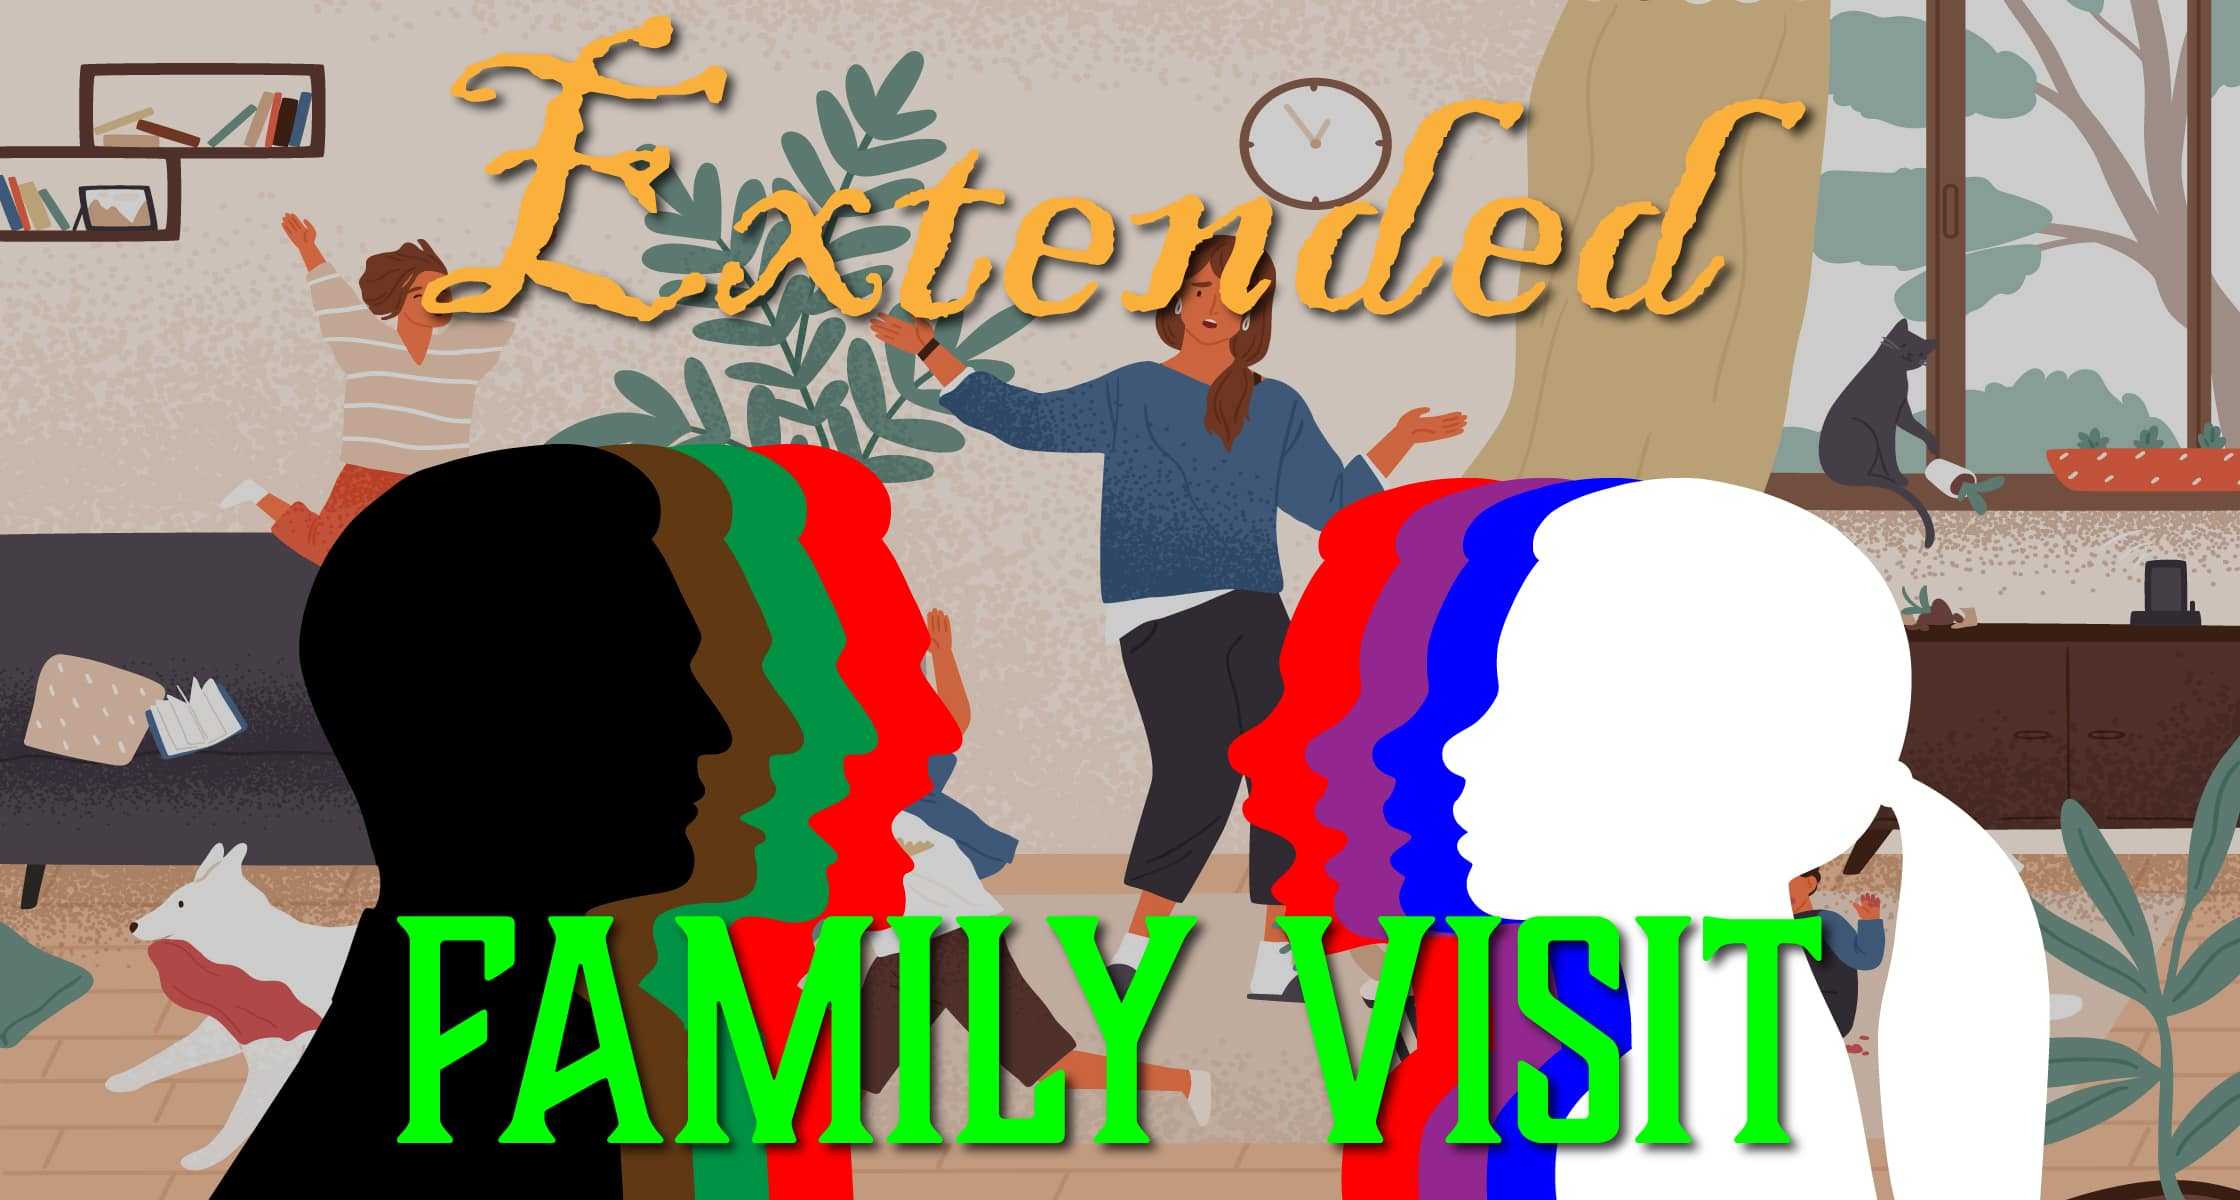 Extended Family Visit